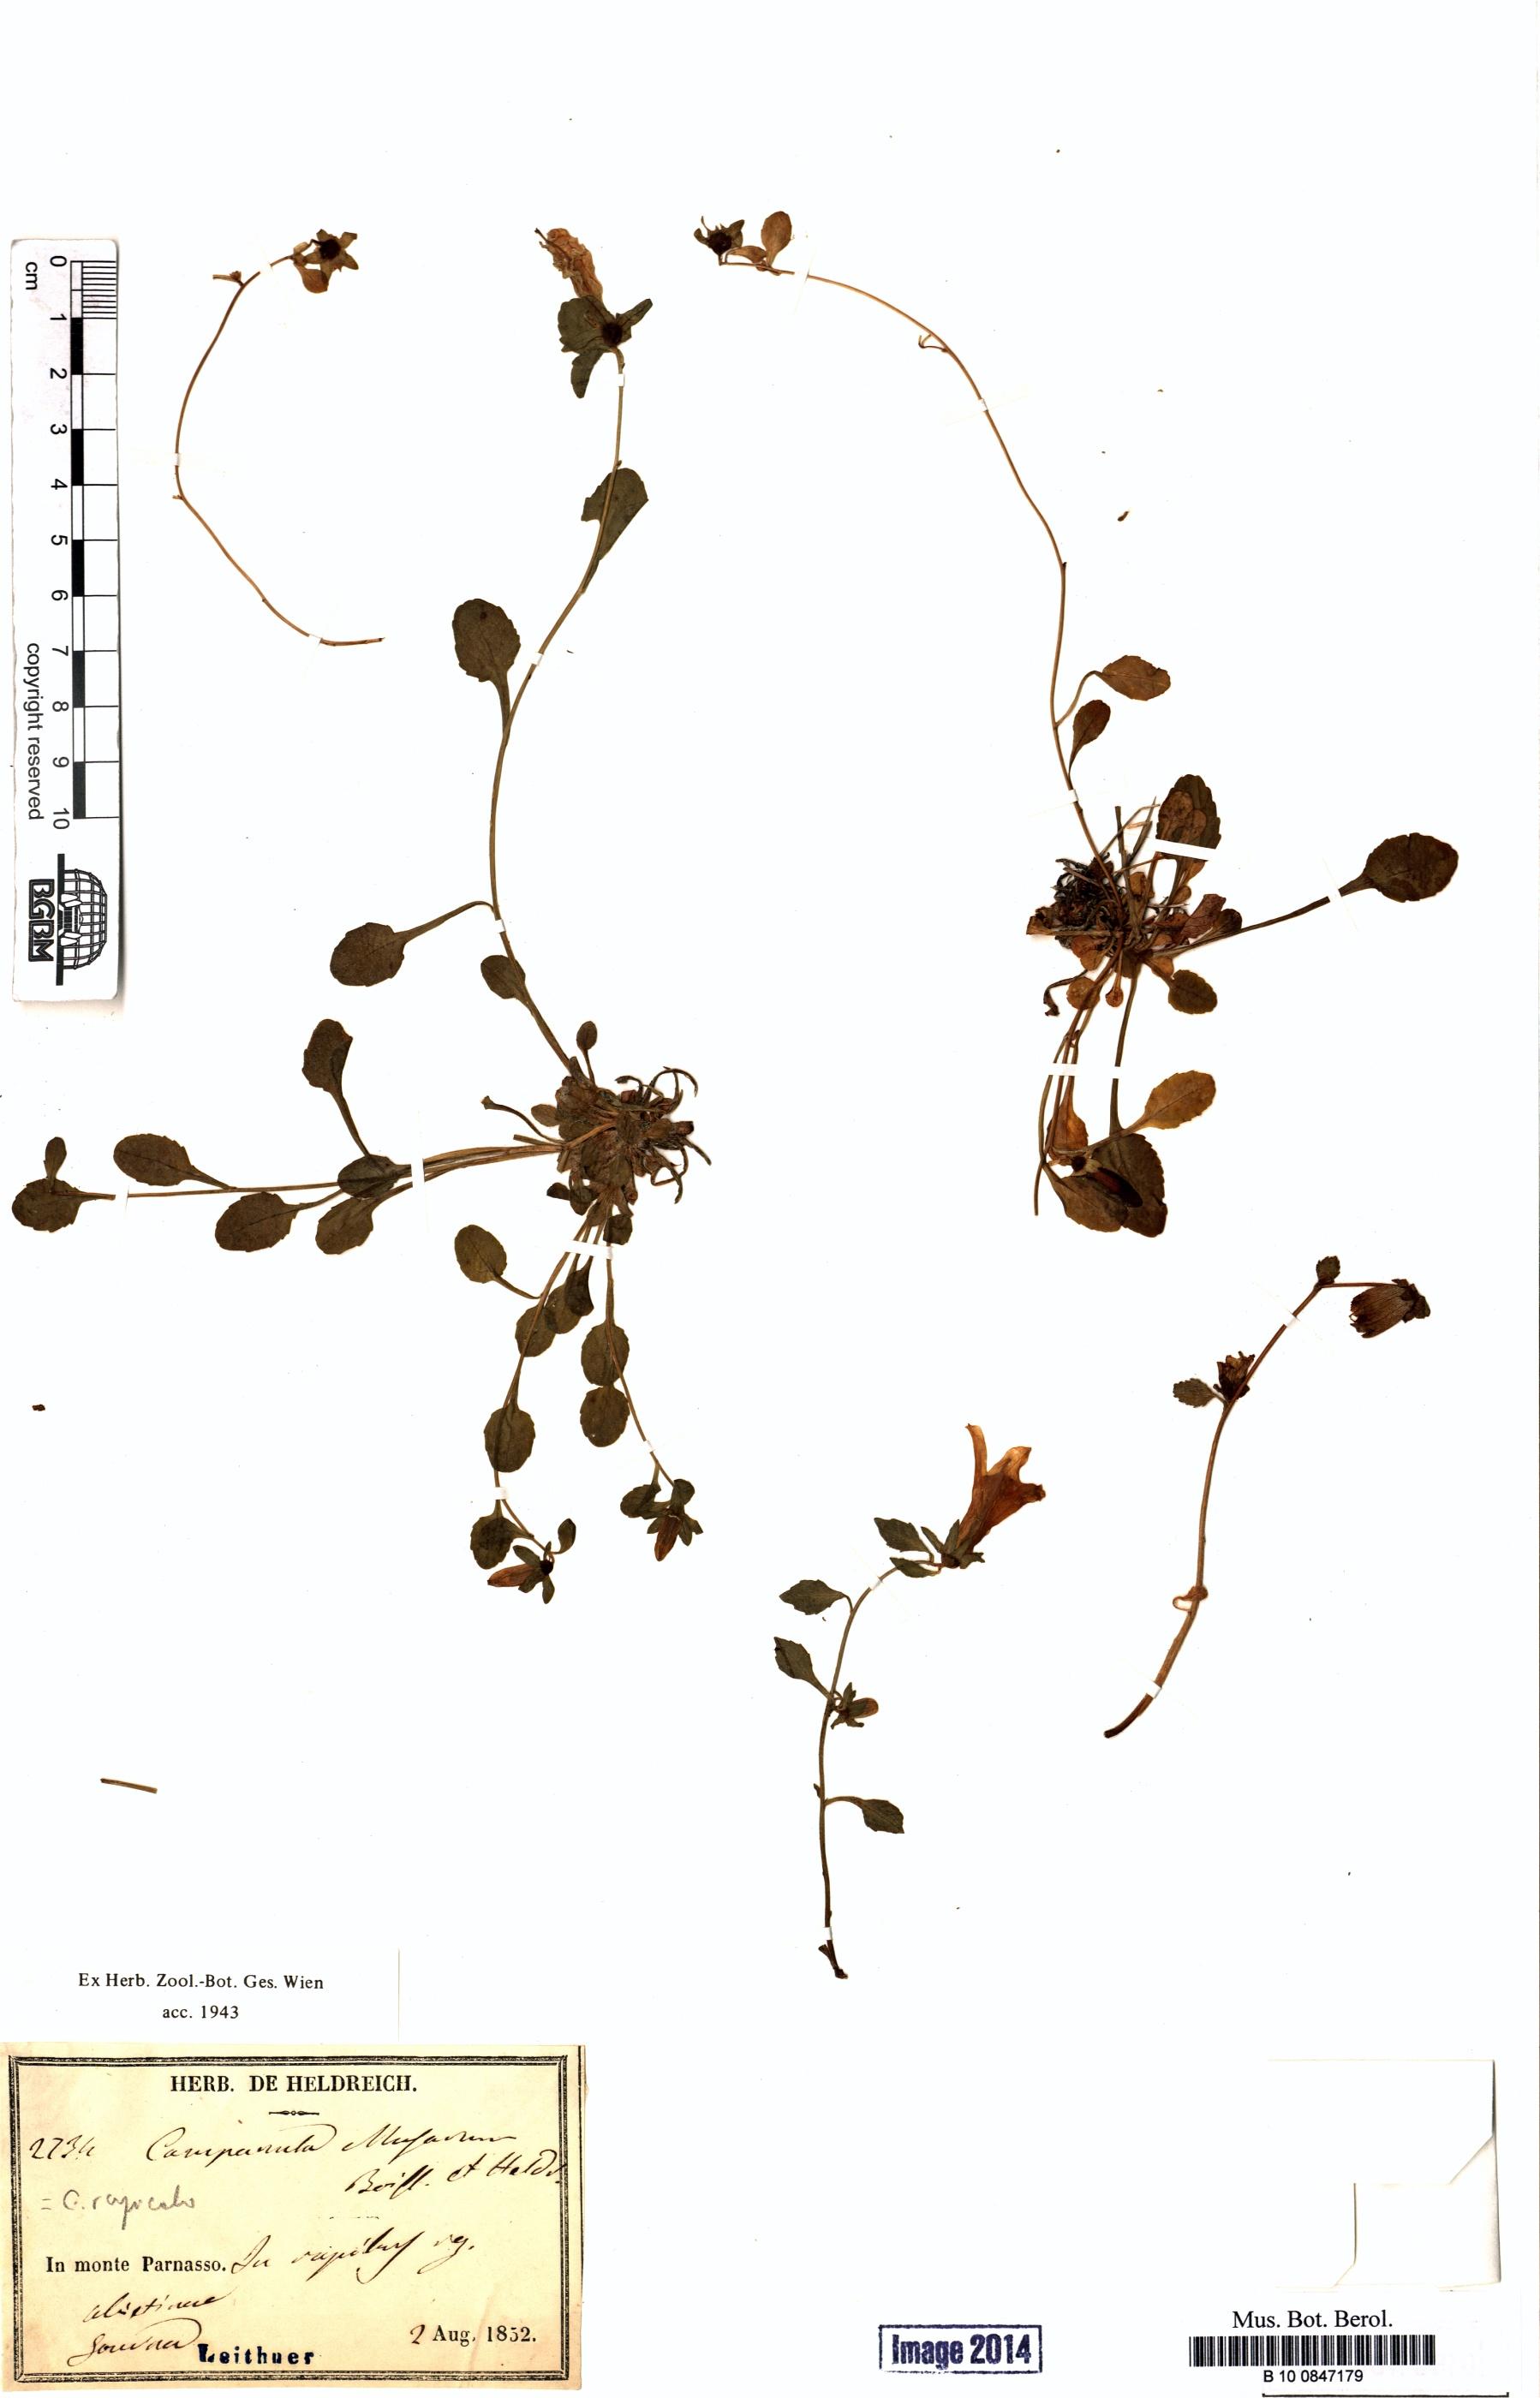 http://ww2.bgbm.org/herbarium/images/B/10/08/47/17/B_10_0847179.jpg